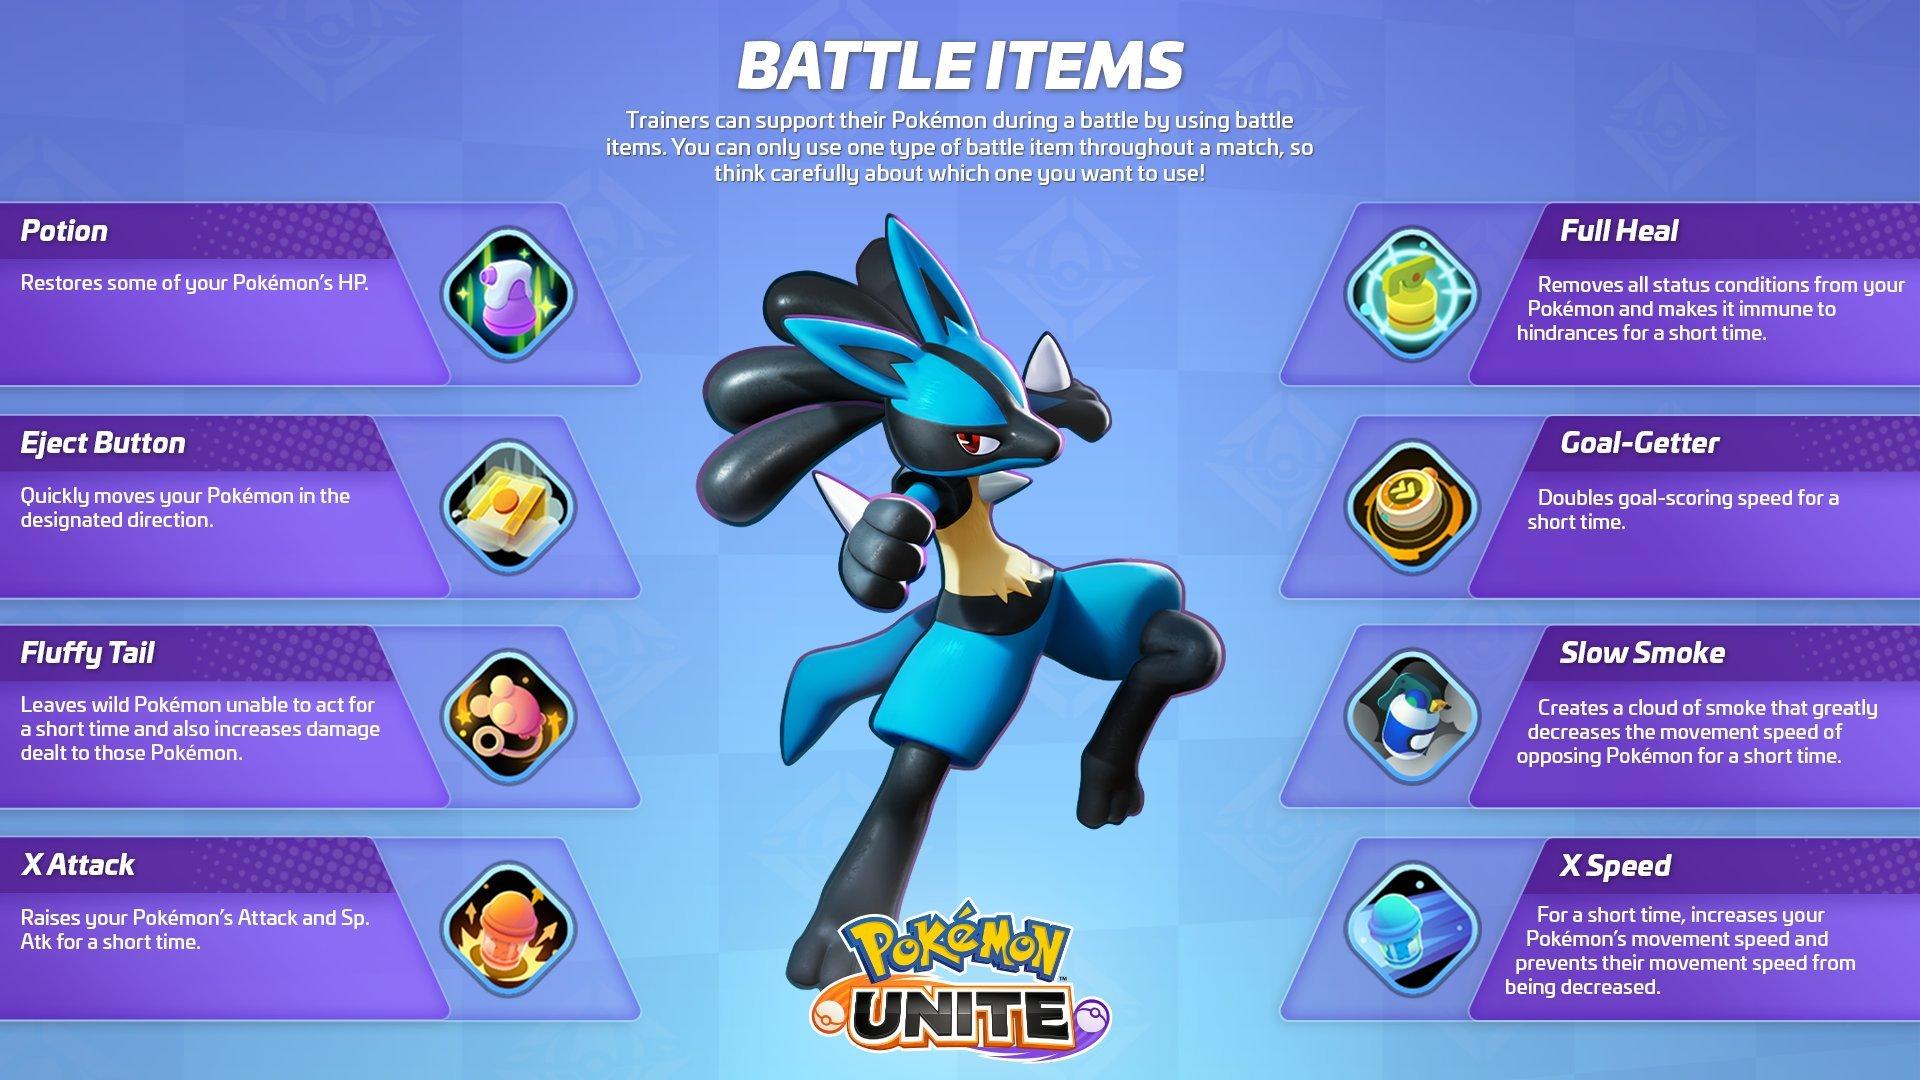 Pokemon unite items list all battle items